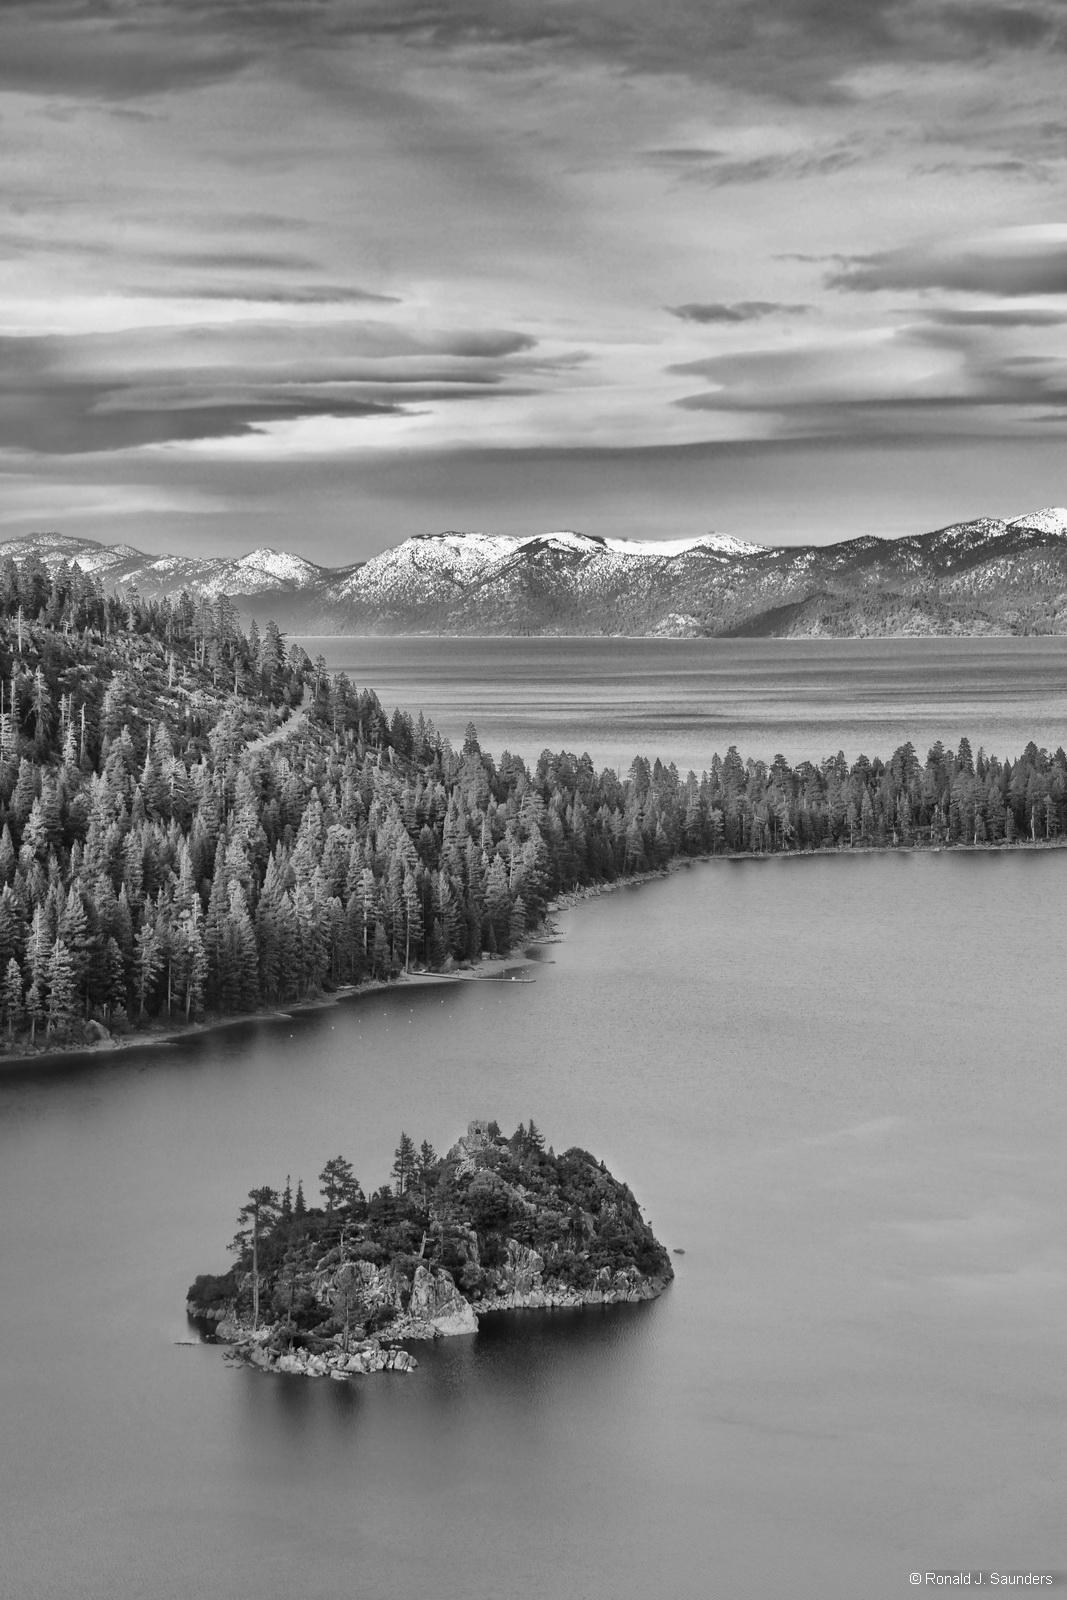 Tahoe, Lake, ron, Saunders, water, Ronald, saunders, black, white, ron, saunders, ronald, ronald j saunders, landscape, photography, , photo